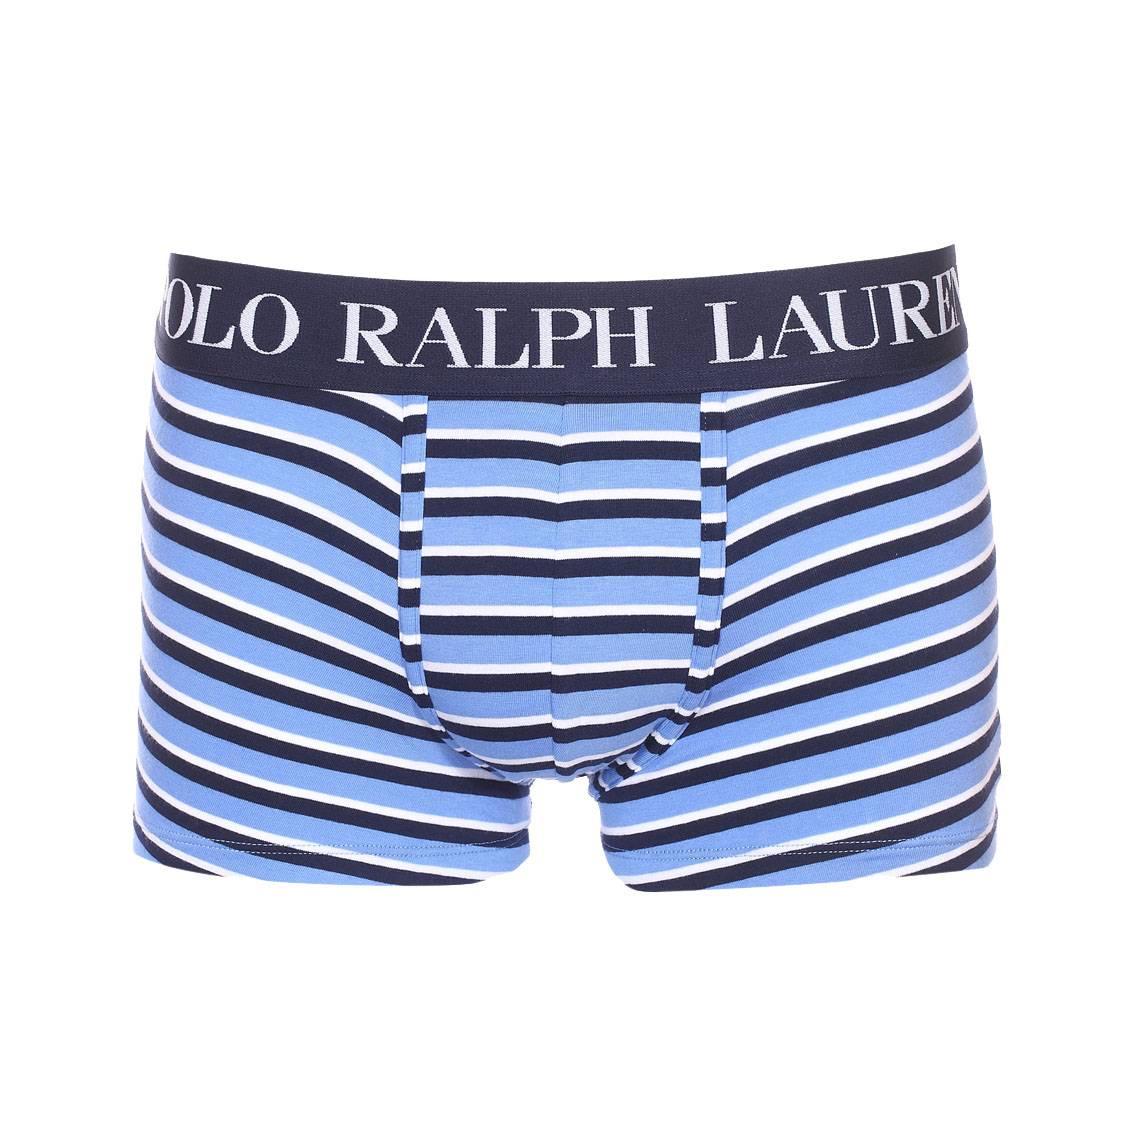 Boxer  en coton stretch bleu indigo à rayures blanches et noires